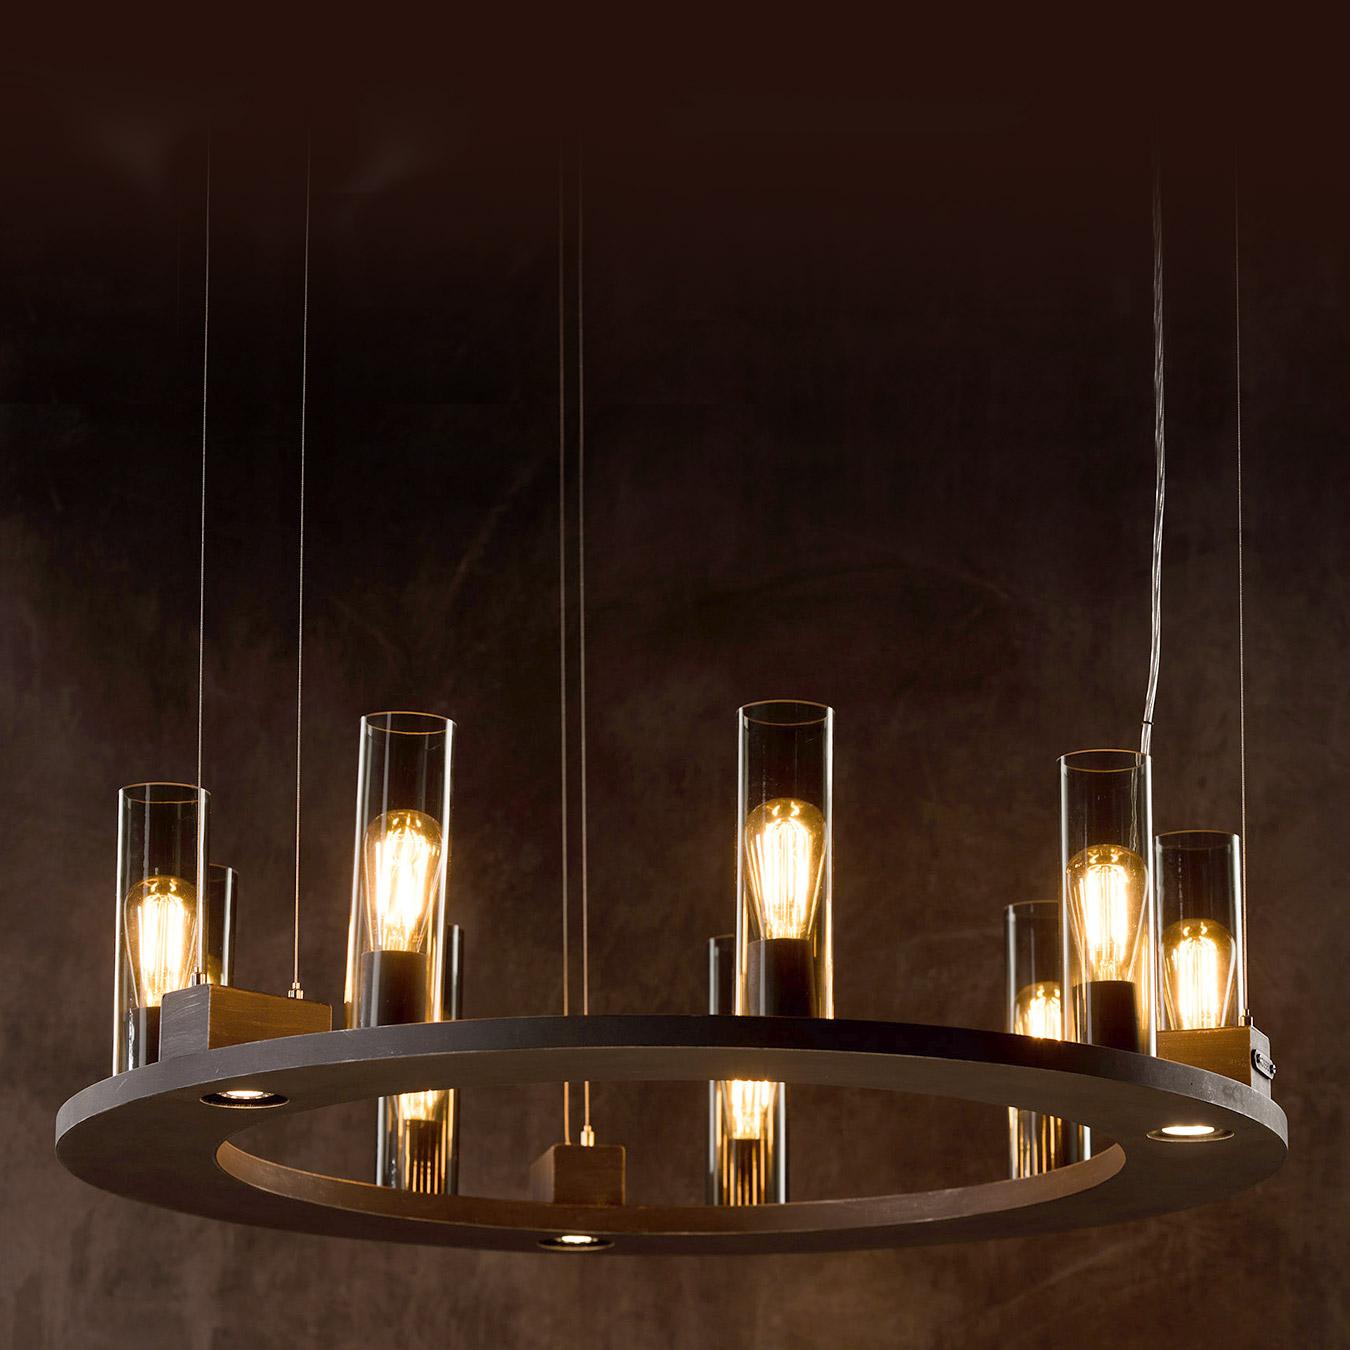 Blickfang: Ring-Hängeleuchter mit Rauchglas-Zylindern - Casa Lumi